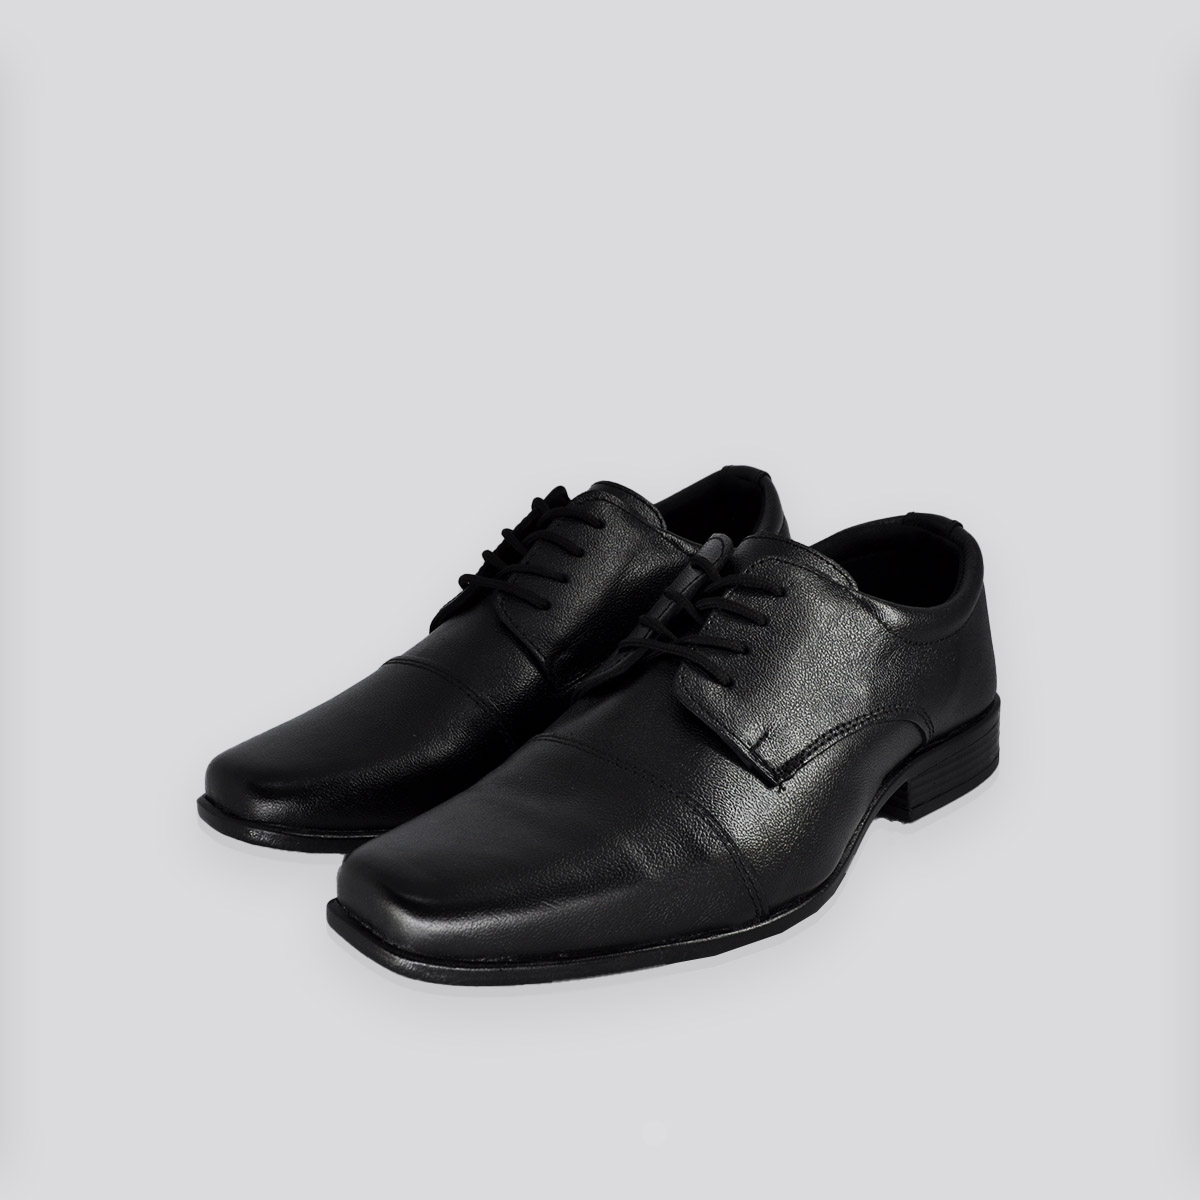 Sapato Social Masculino Andar Shoes  Amarrar Preto